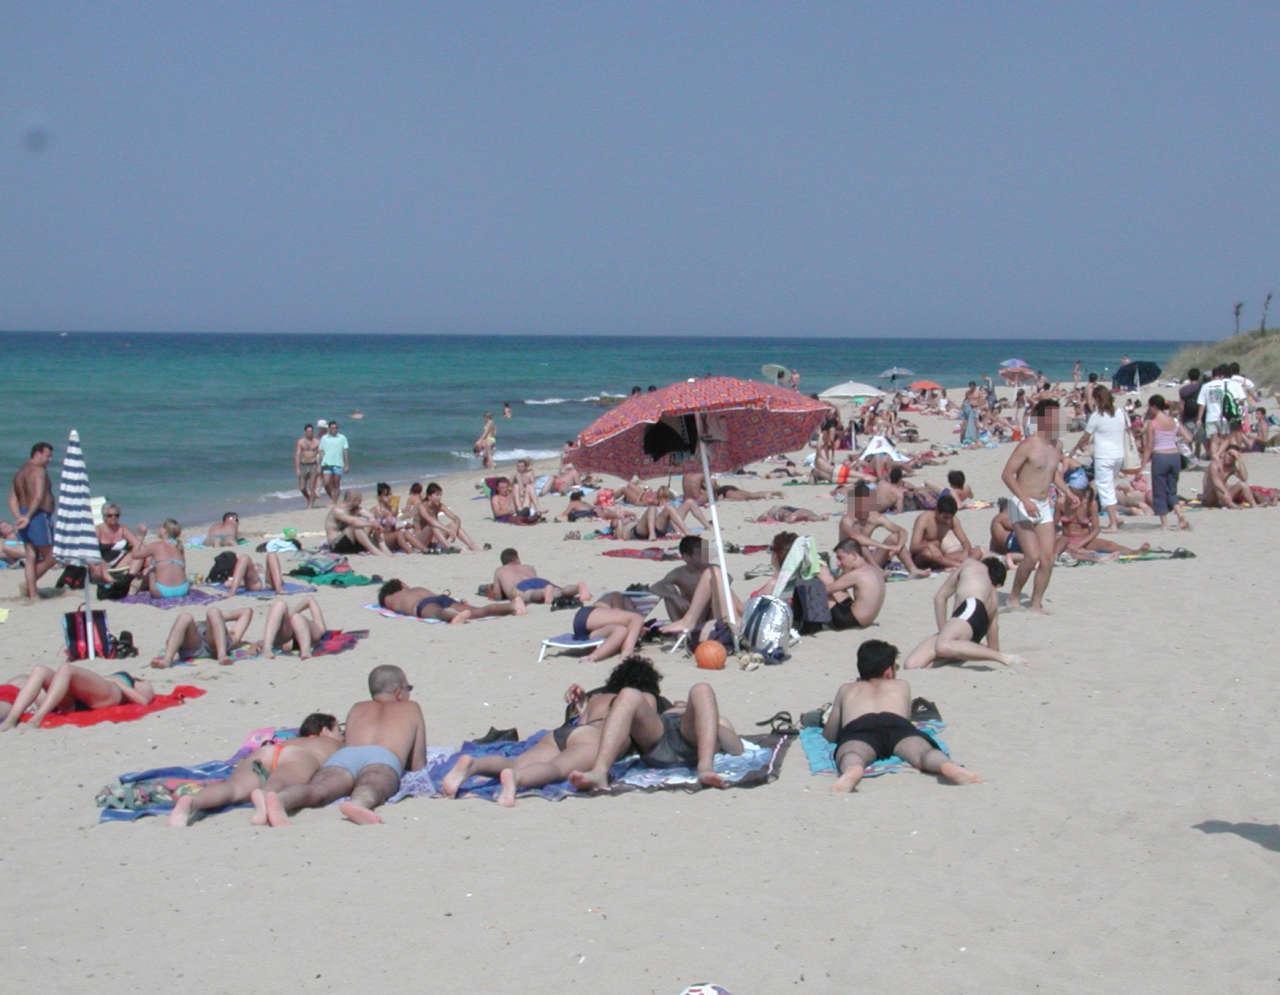 le dune spiaggia libera